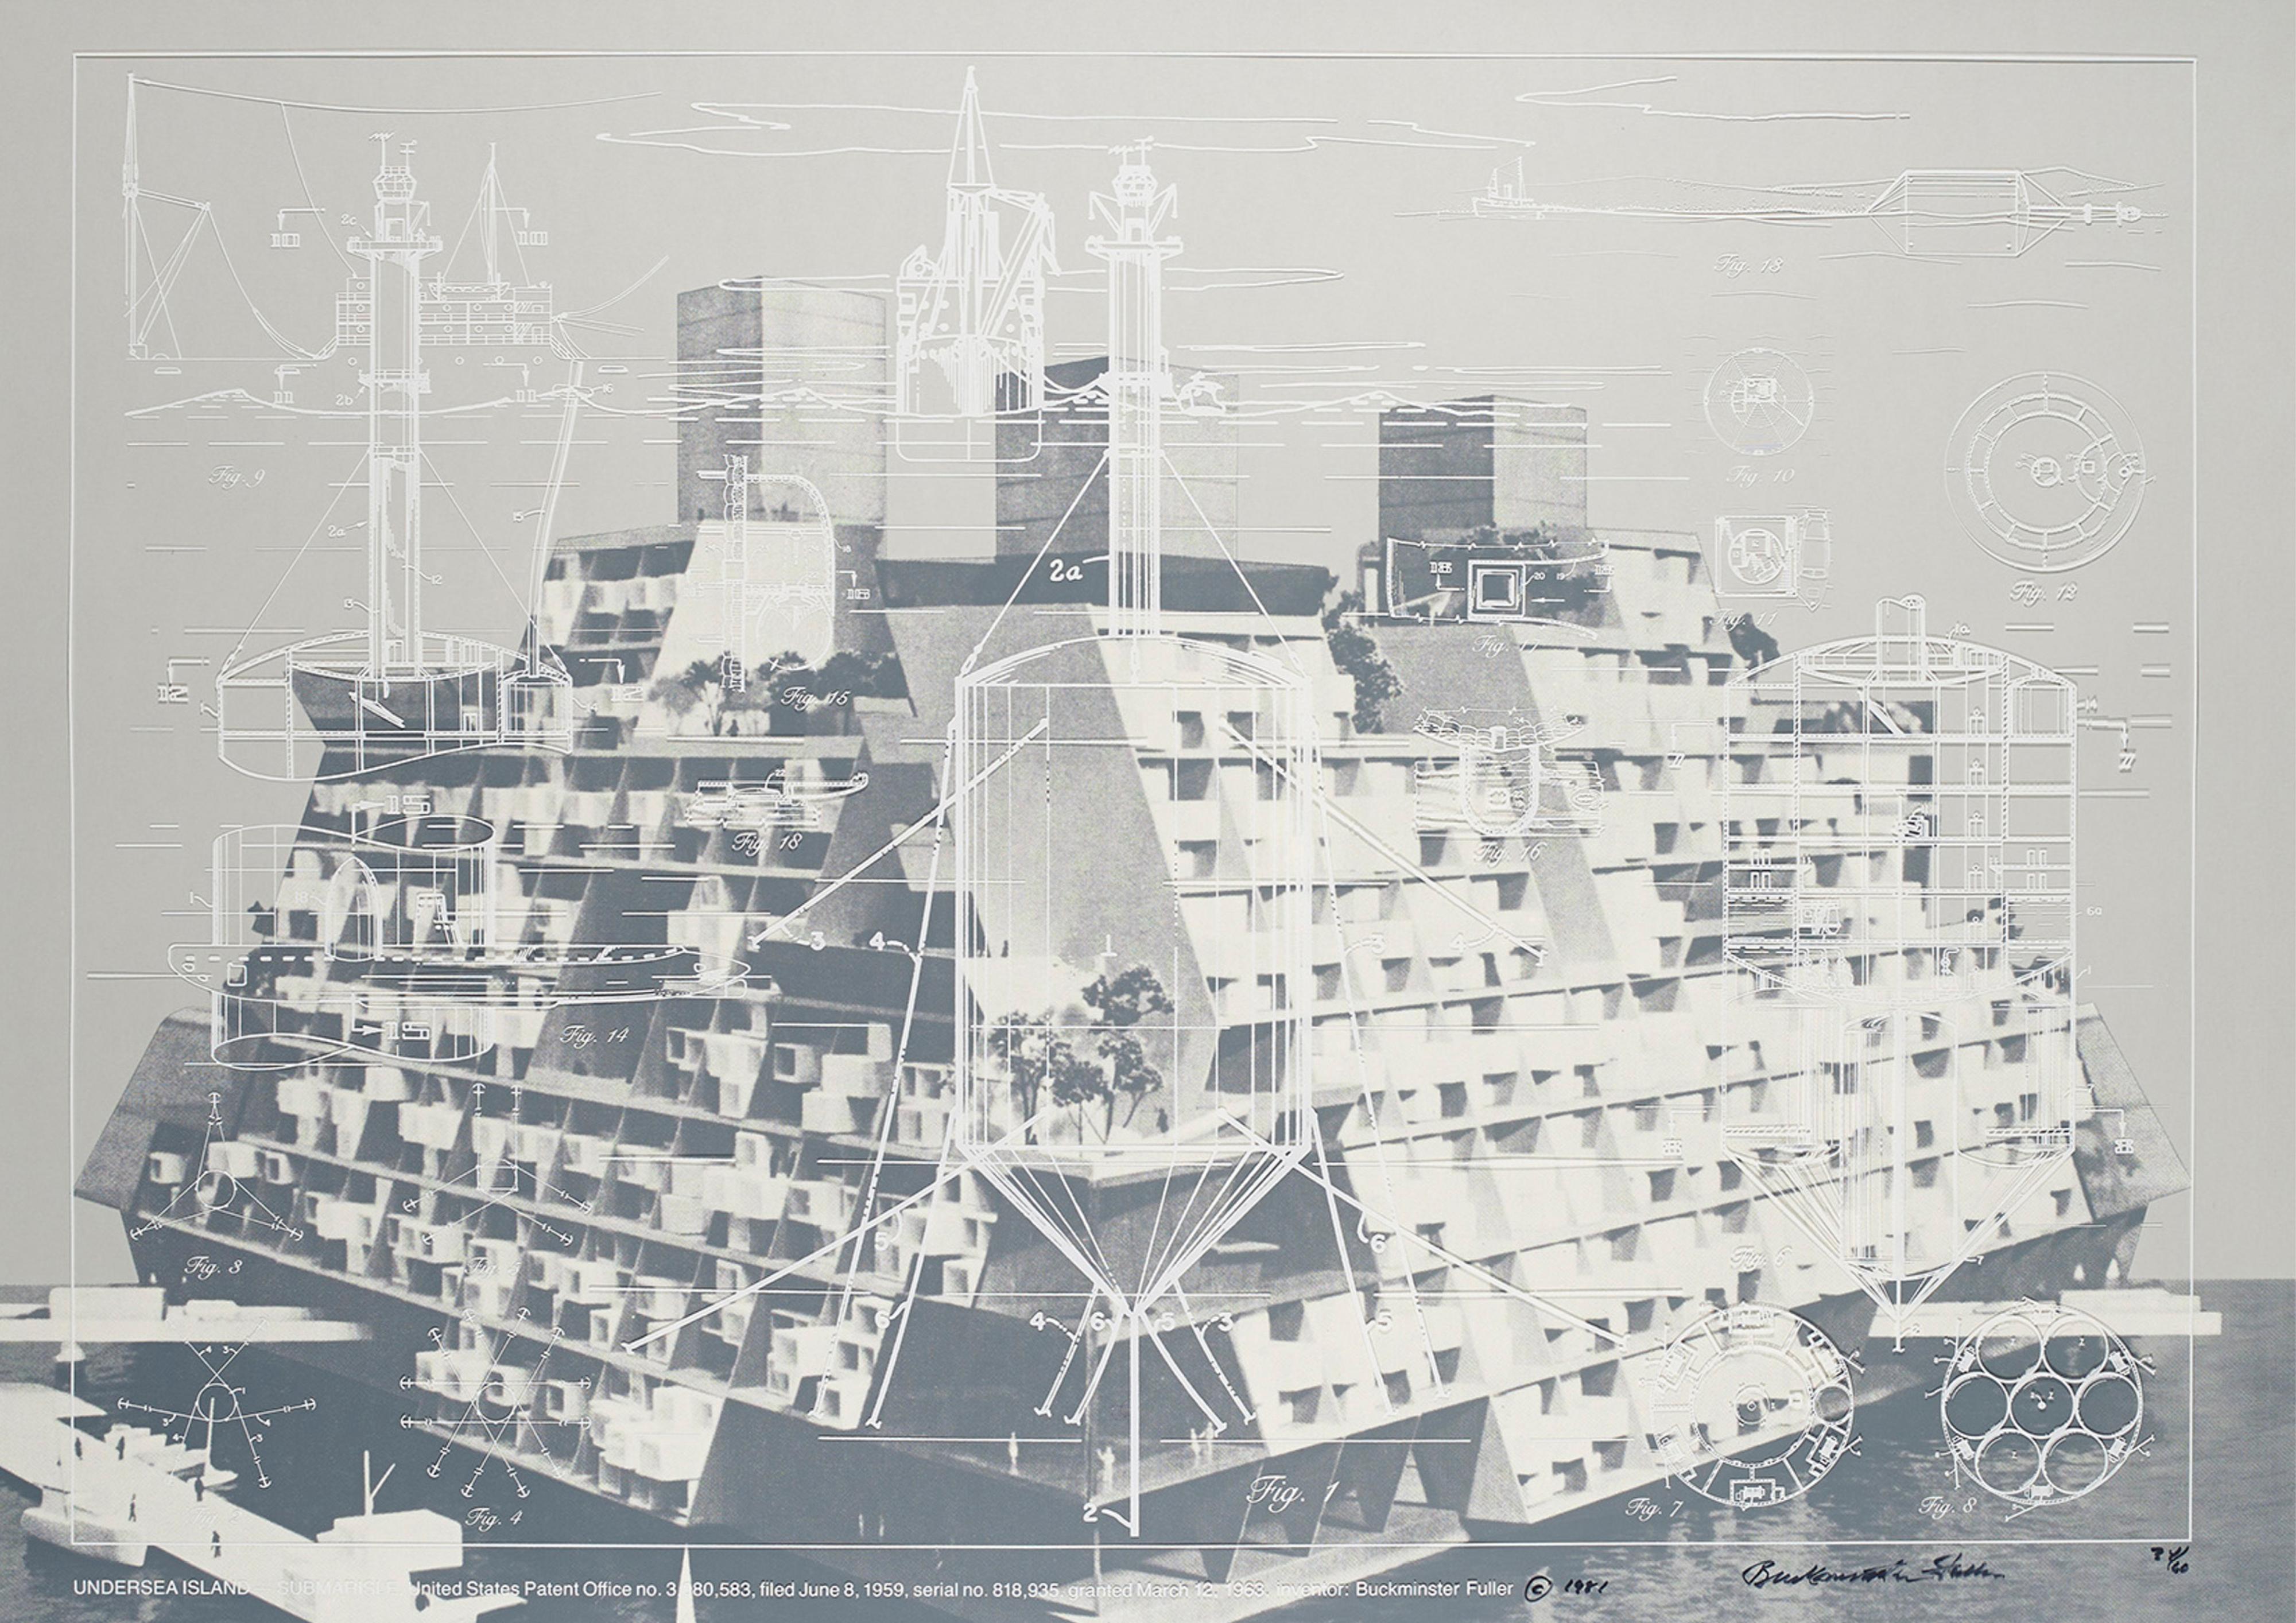 XII works by Richard Buckminster Fuller (322AR) — Atlas of